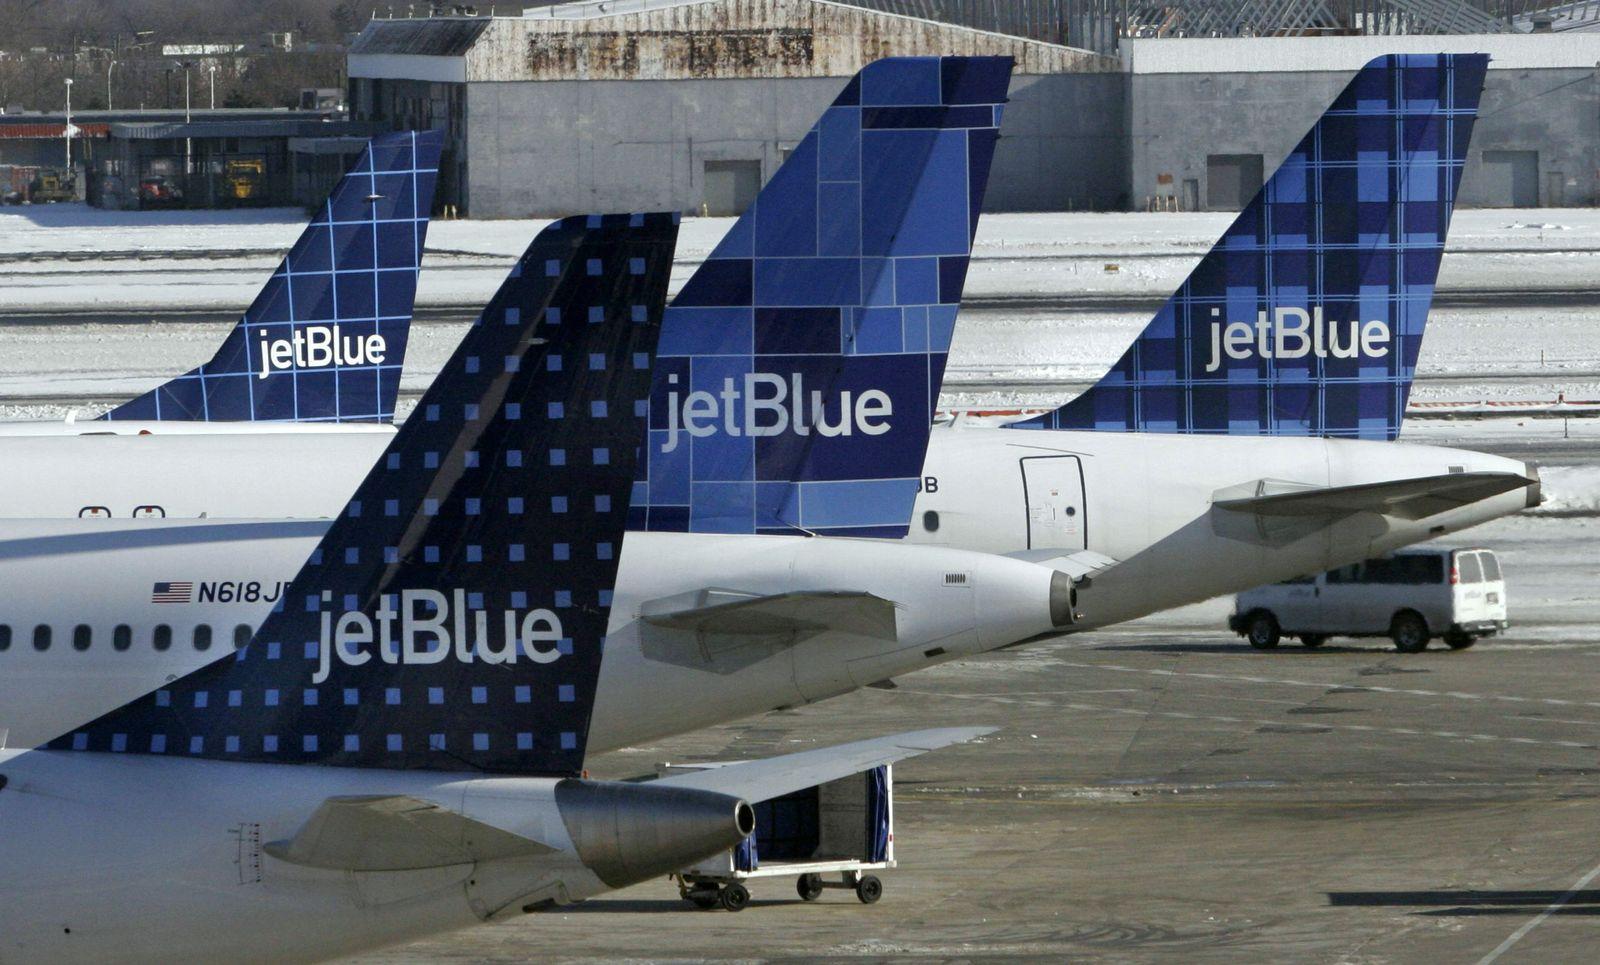 US-Fluggesellschaft Jetblue